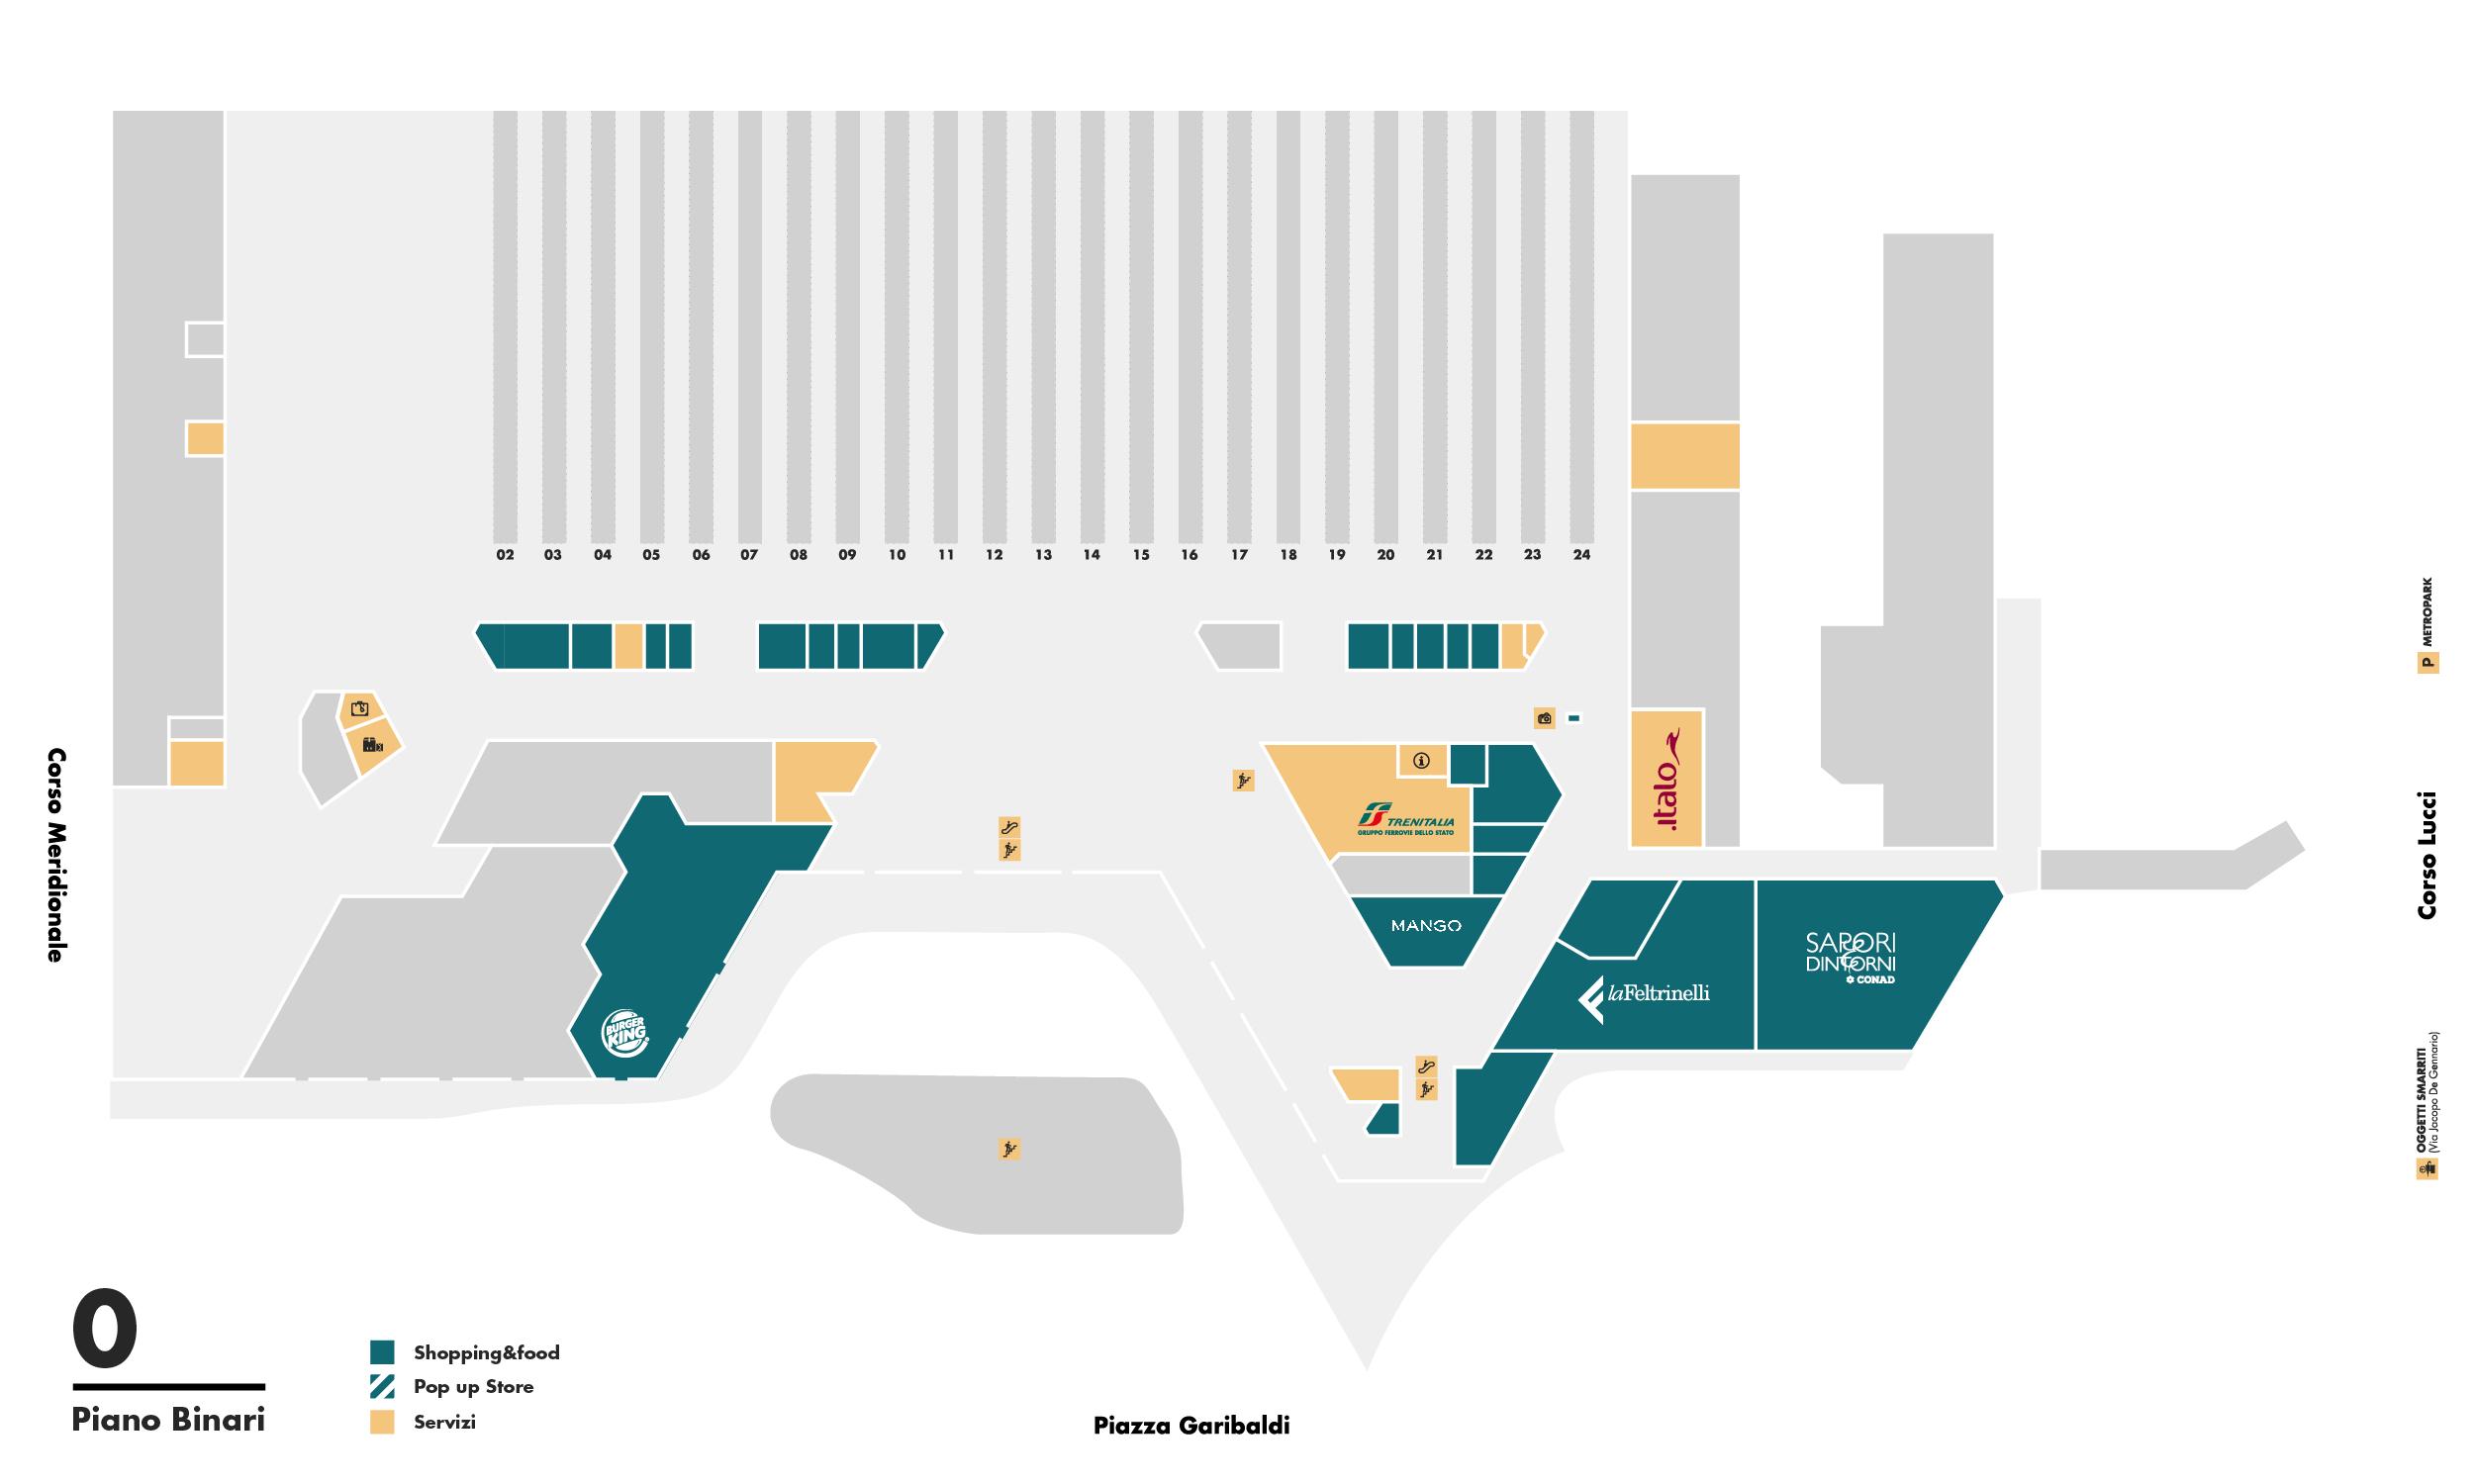 Left luggage kipoint platform floor napoli centrale mappa del piano ccuart Choice Image